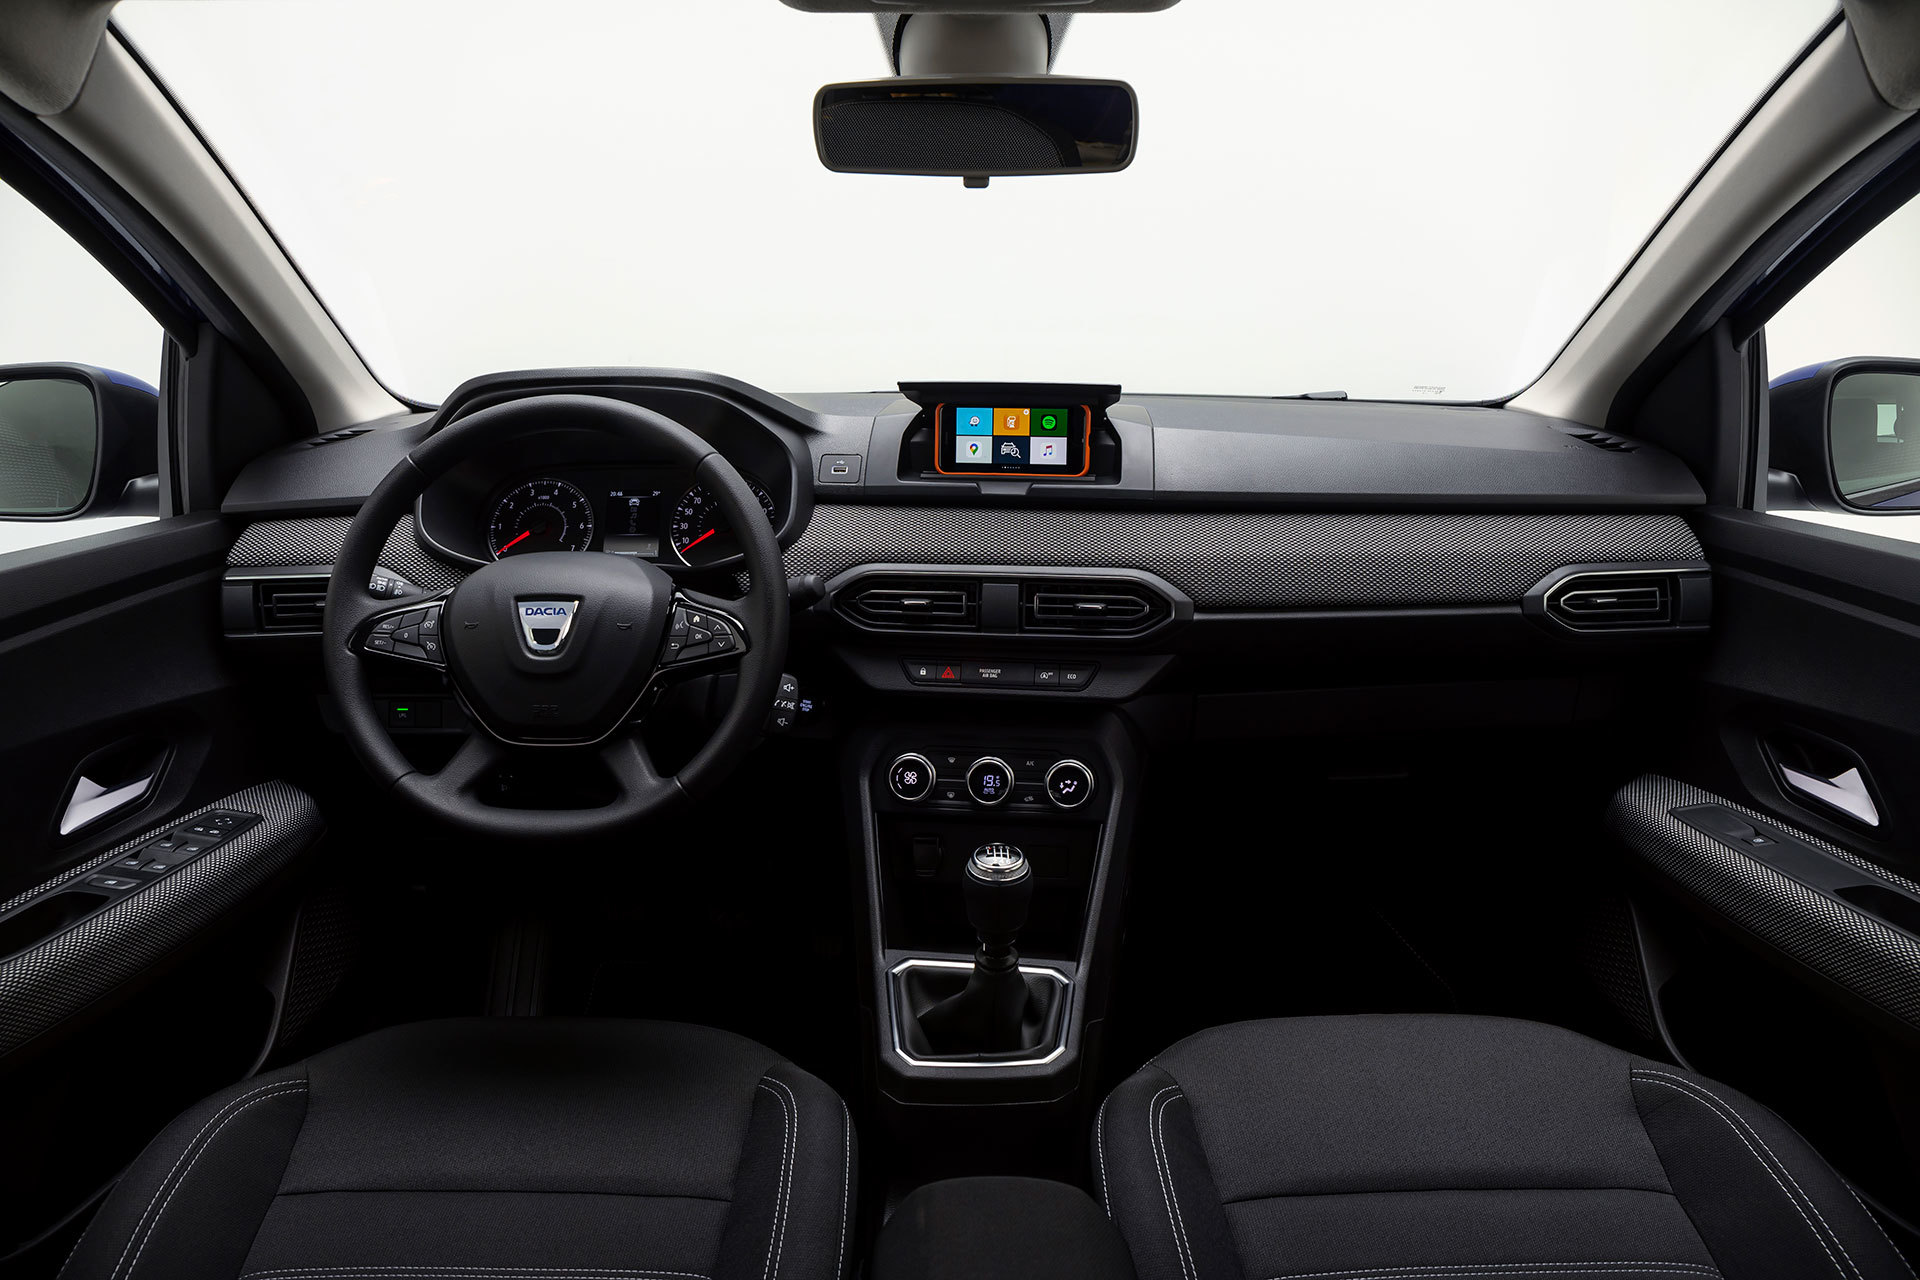 Dacia Sandero 2020 Interior 05